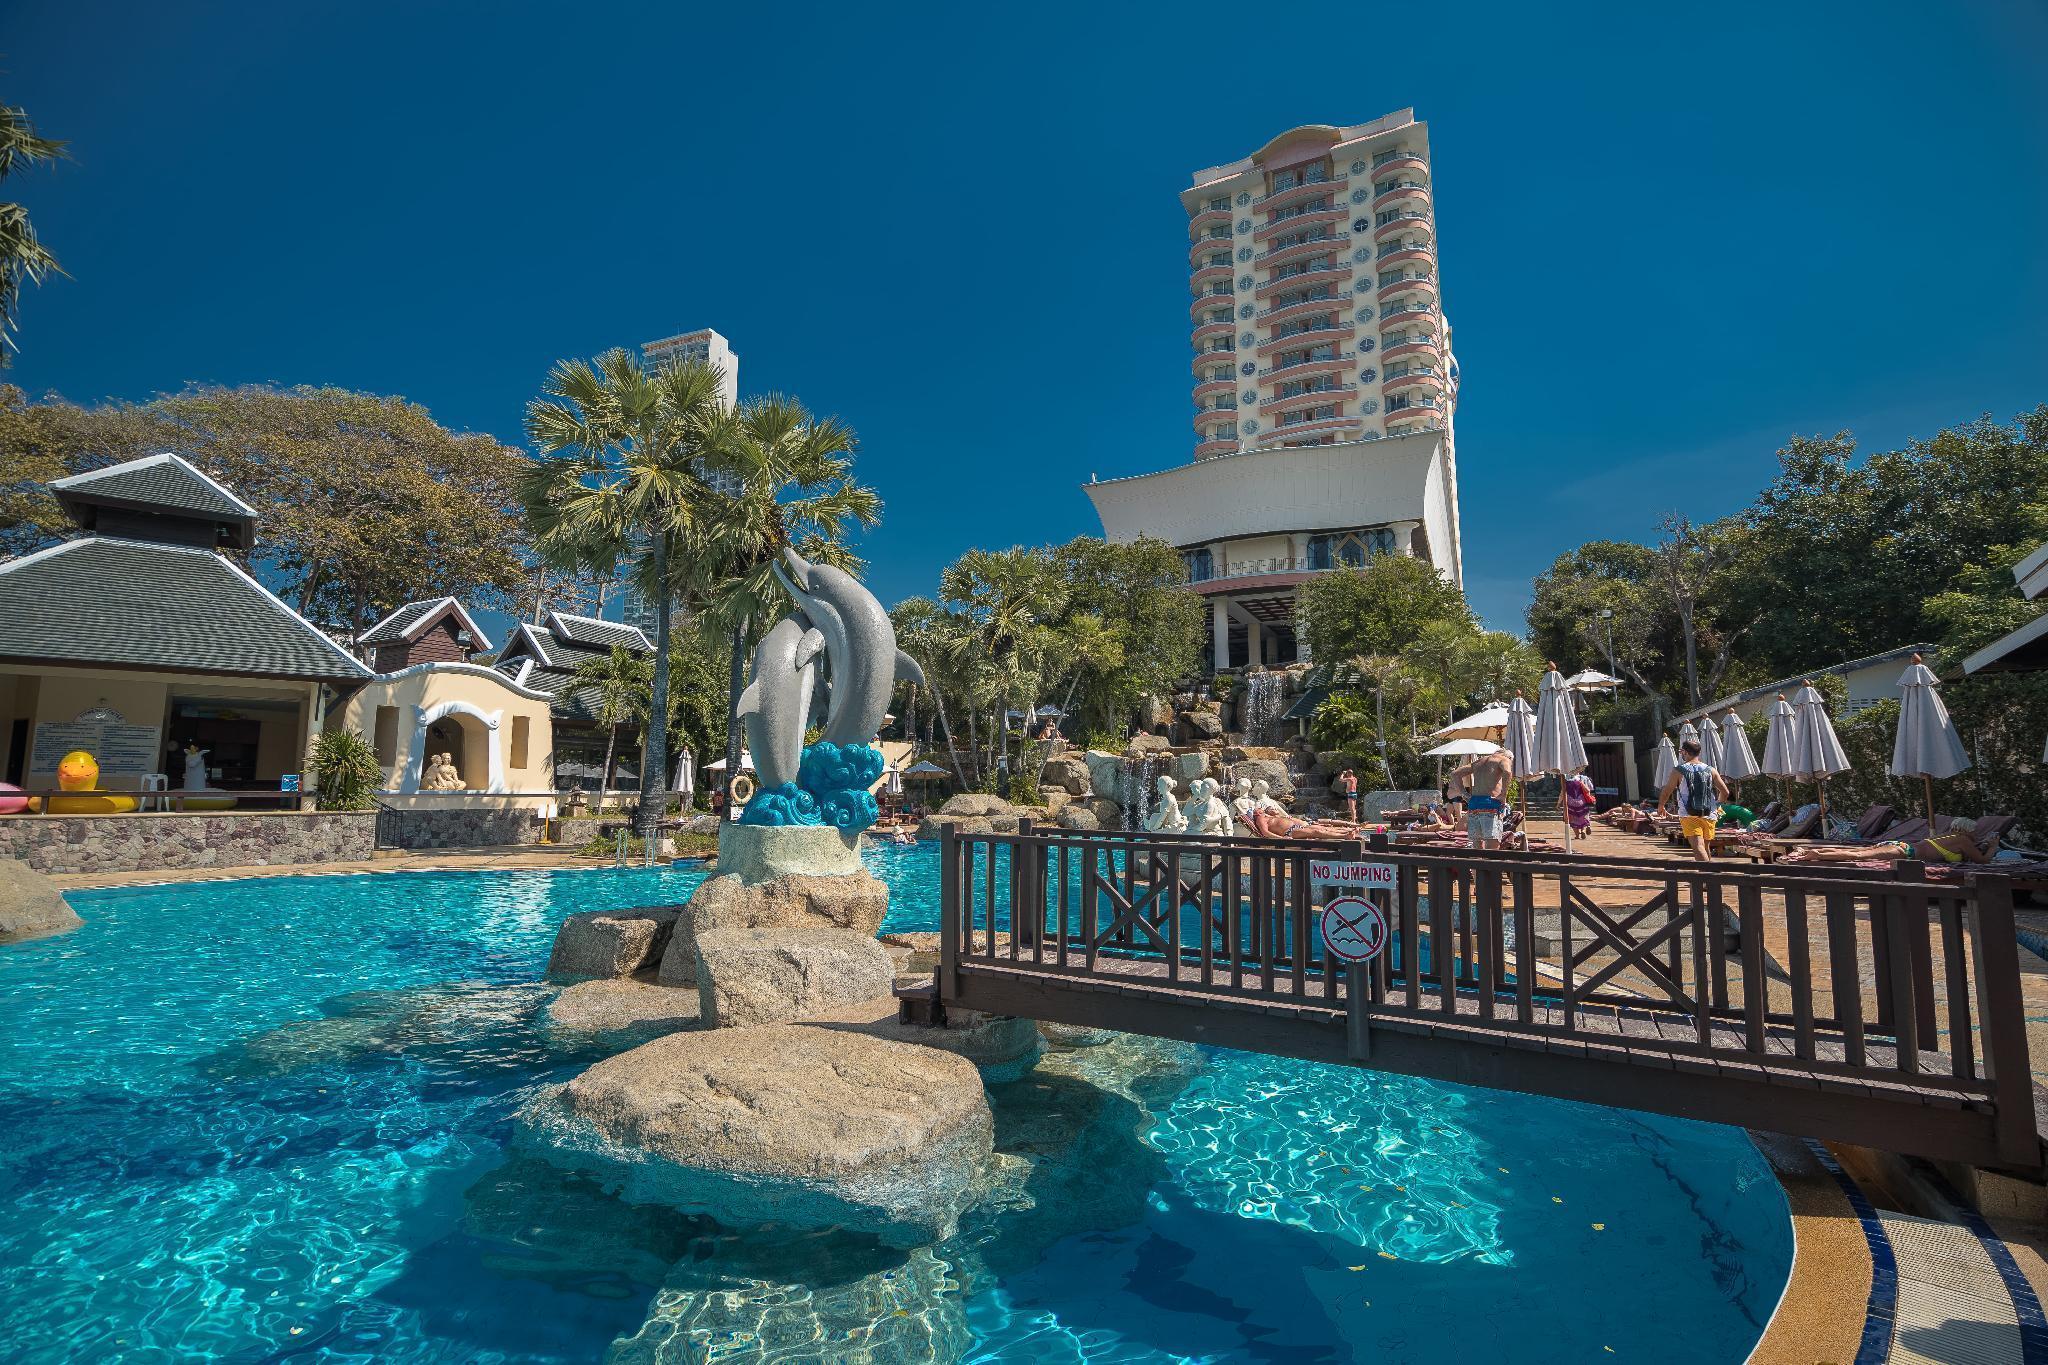 Long Beach Garden Hotel & Spa ลองบีช การ์เดน โฮเต็ล แอนด์ สปา